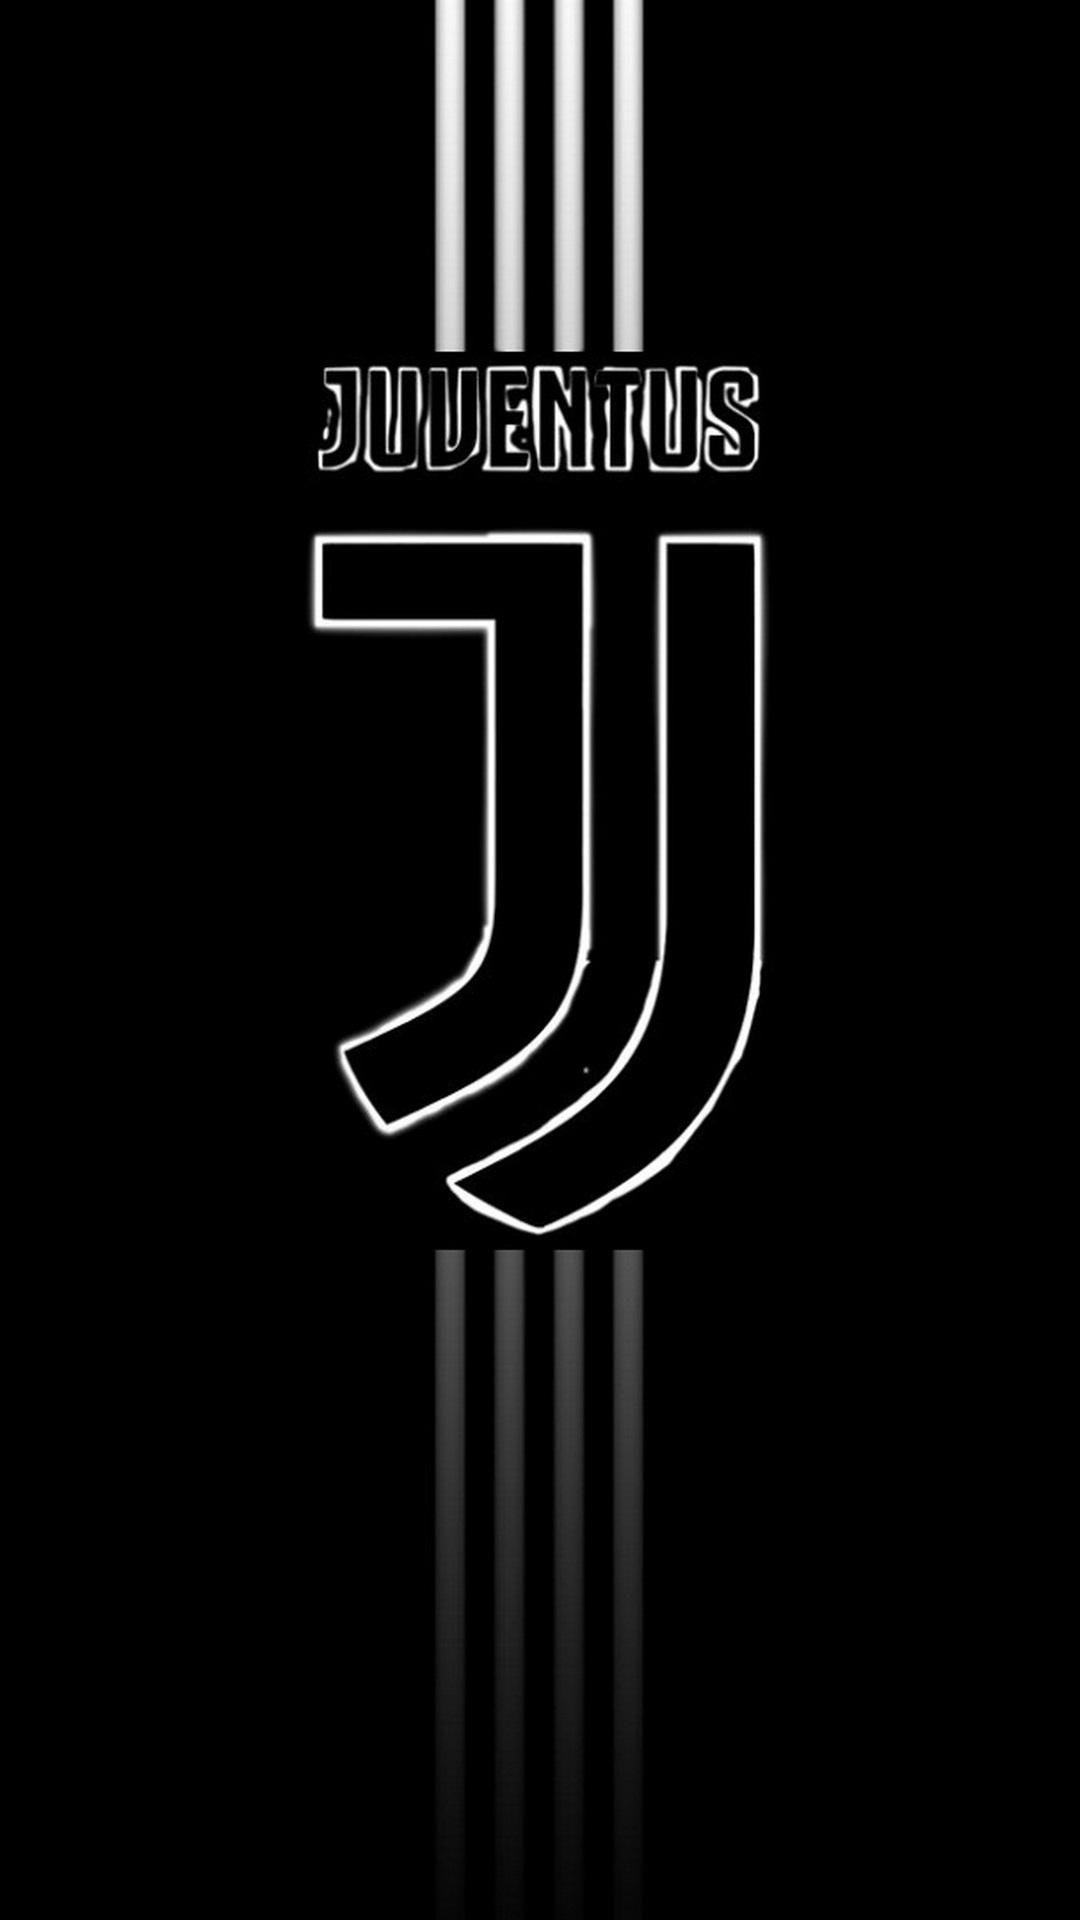 640 gambar gambar logo juventus 2019 terkini di 2020 juventus gambar bola kaki 640 gambar gambar logo juventus 2019